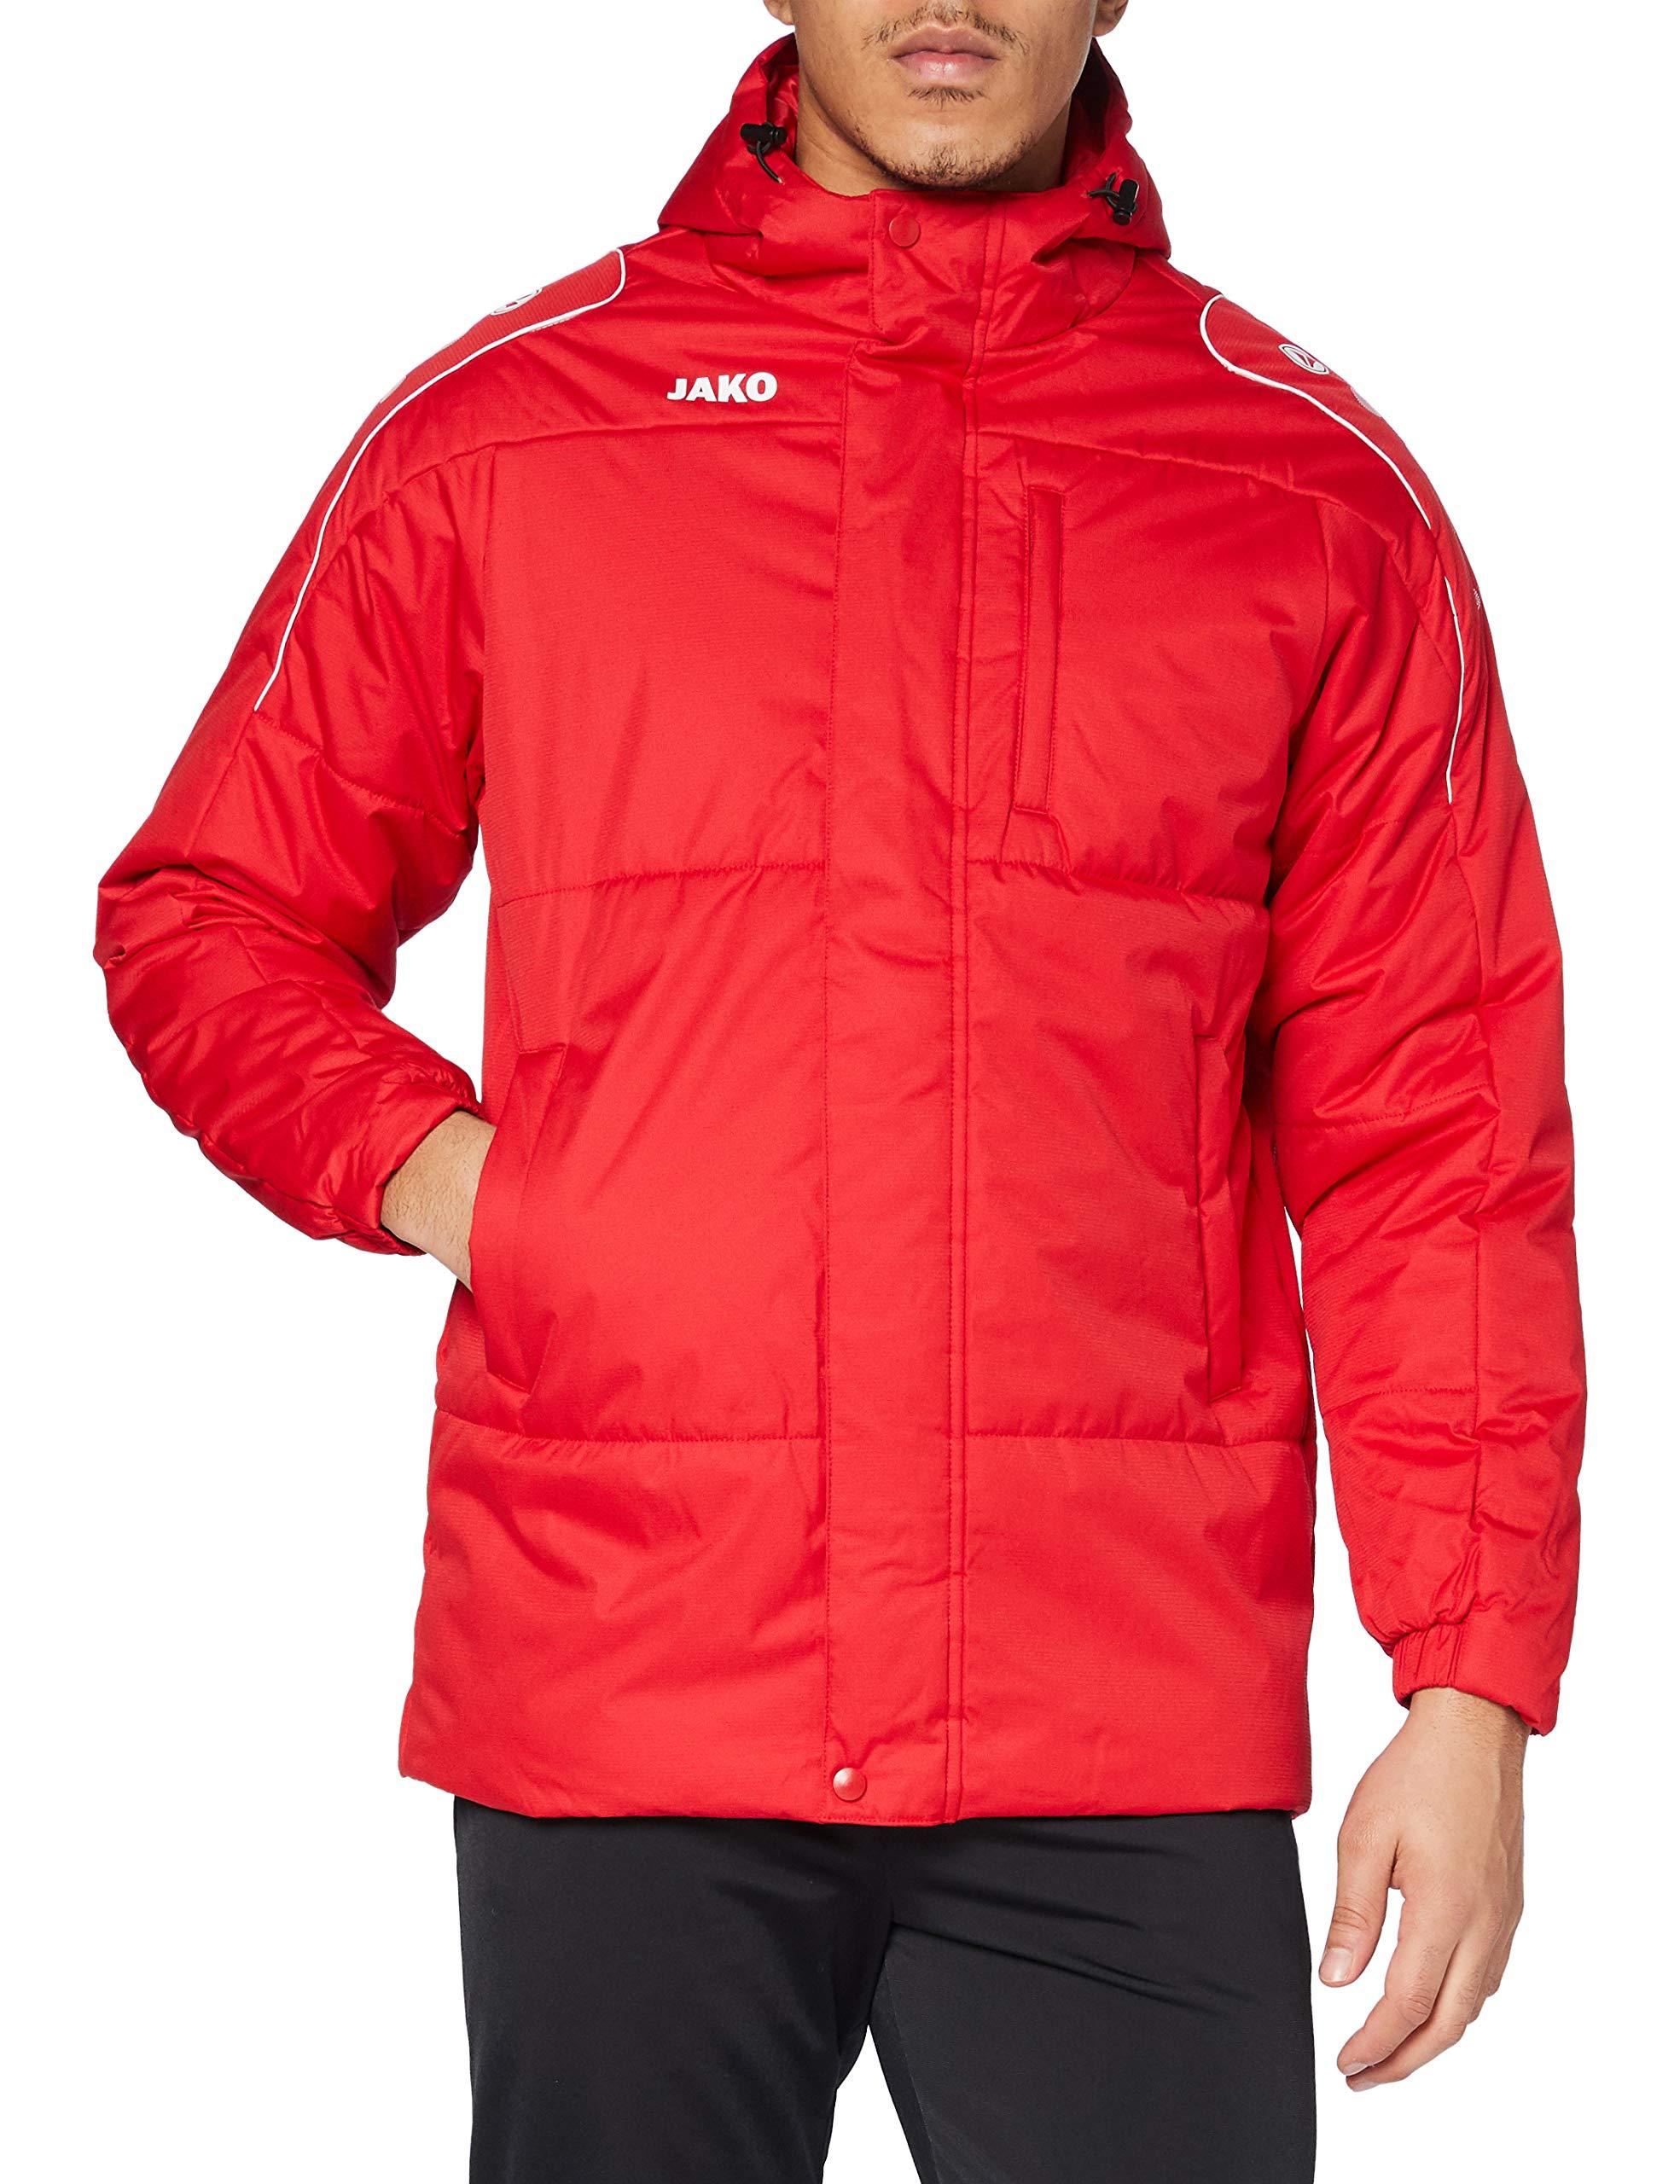 JAKO Erwachsenen Coachjacke Active, rot/weiß, M, 7197